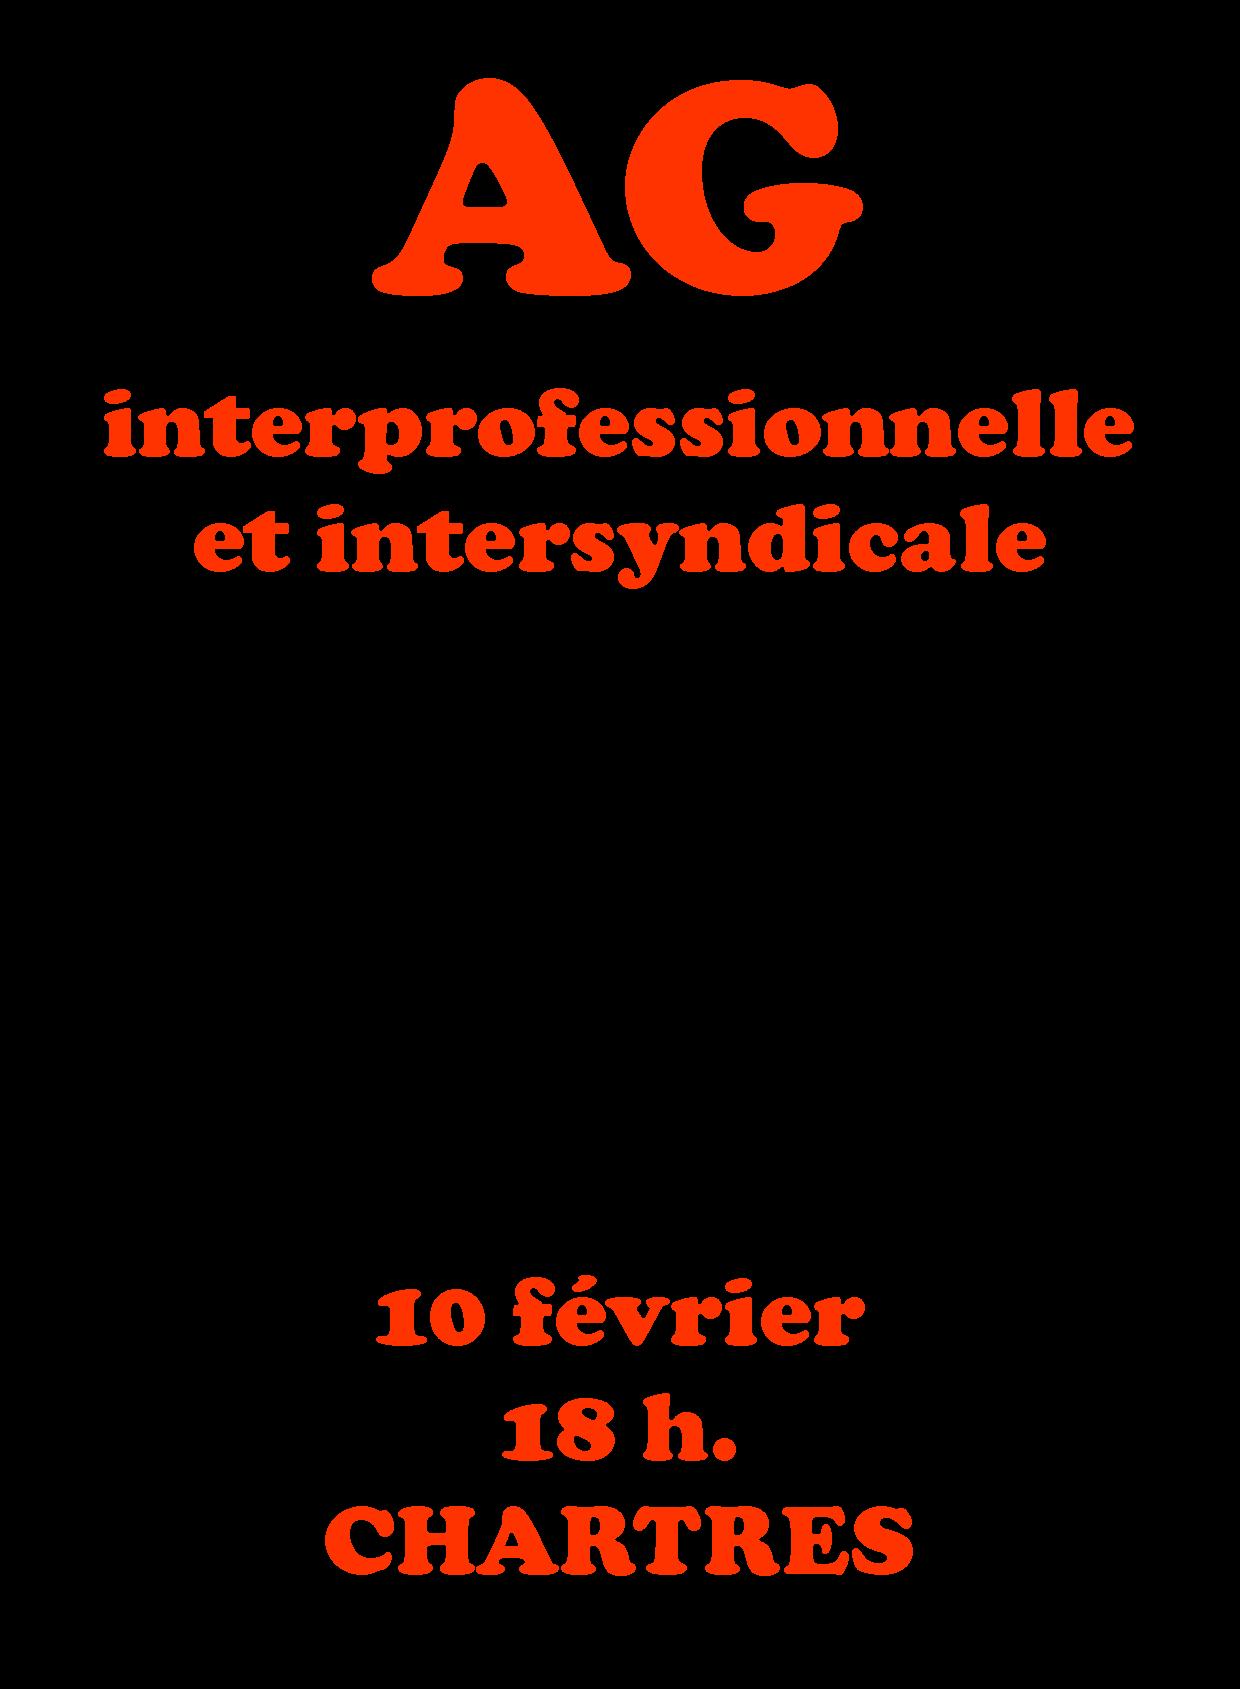 AG 10-02-2020 [Affiche]